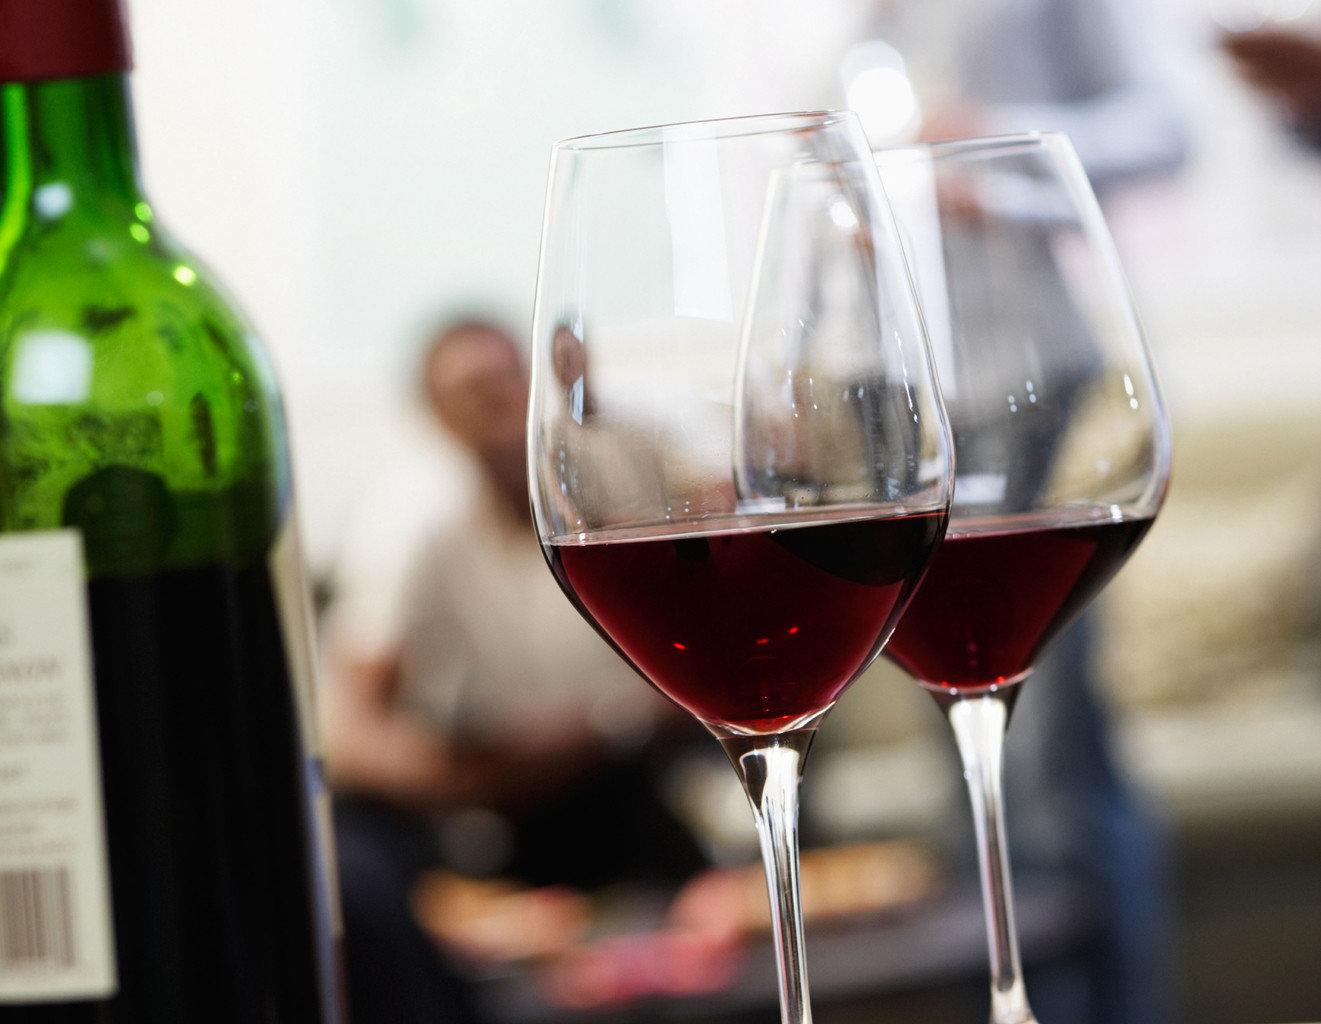 wine alcoholic beverage Drink wine glass red wine beverage food glass alcohol half stemware red wine bottle drinkware sense bottle close empty